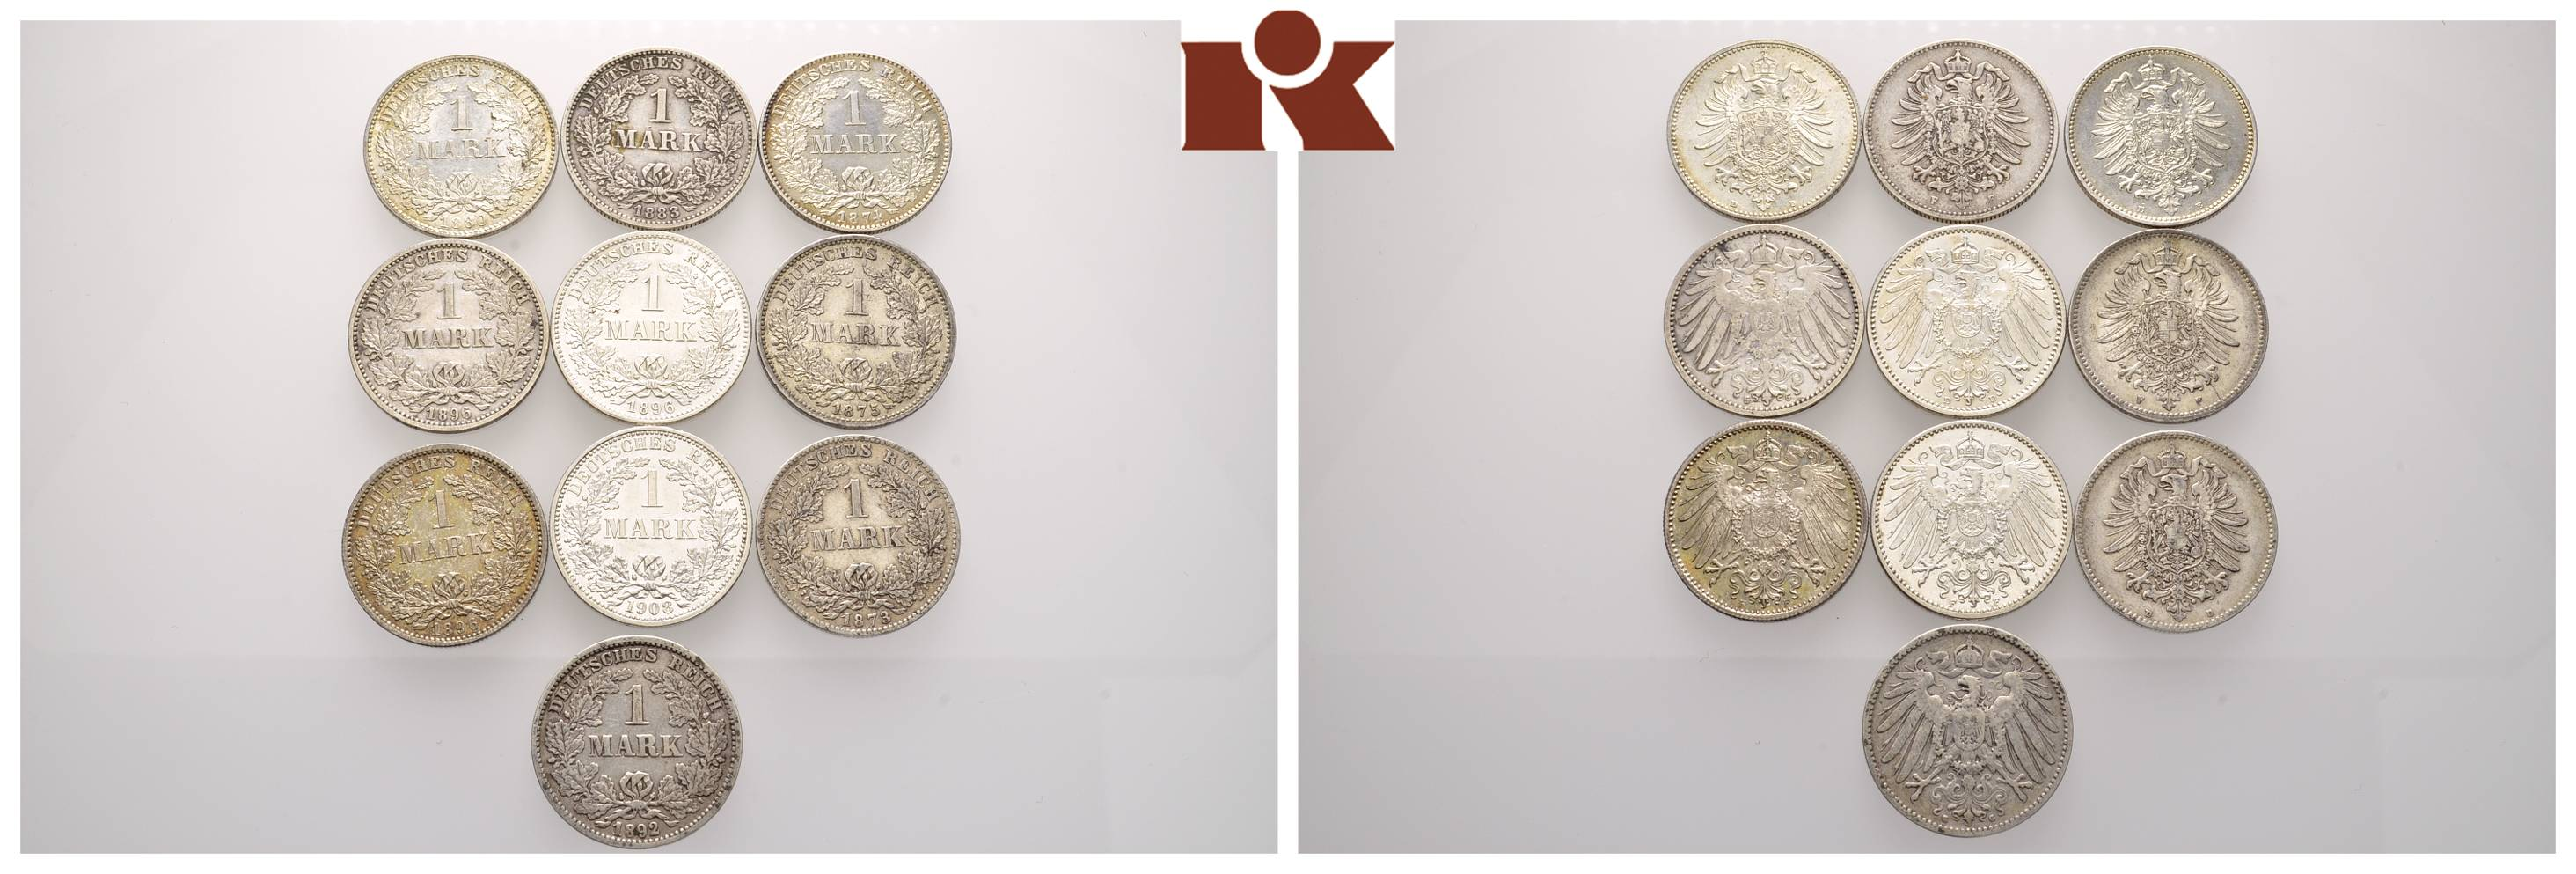 1 Mark 1873 D 1 Mark 1874 E 1 Mark 1875 F 1 Mark 1880 D 1 Mark